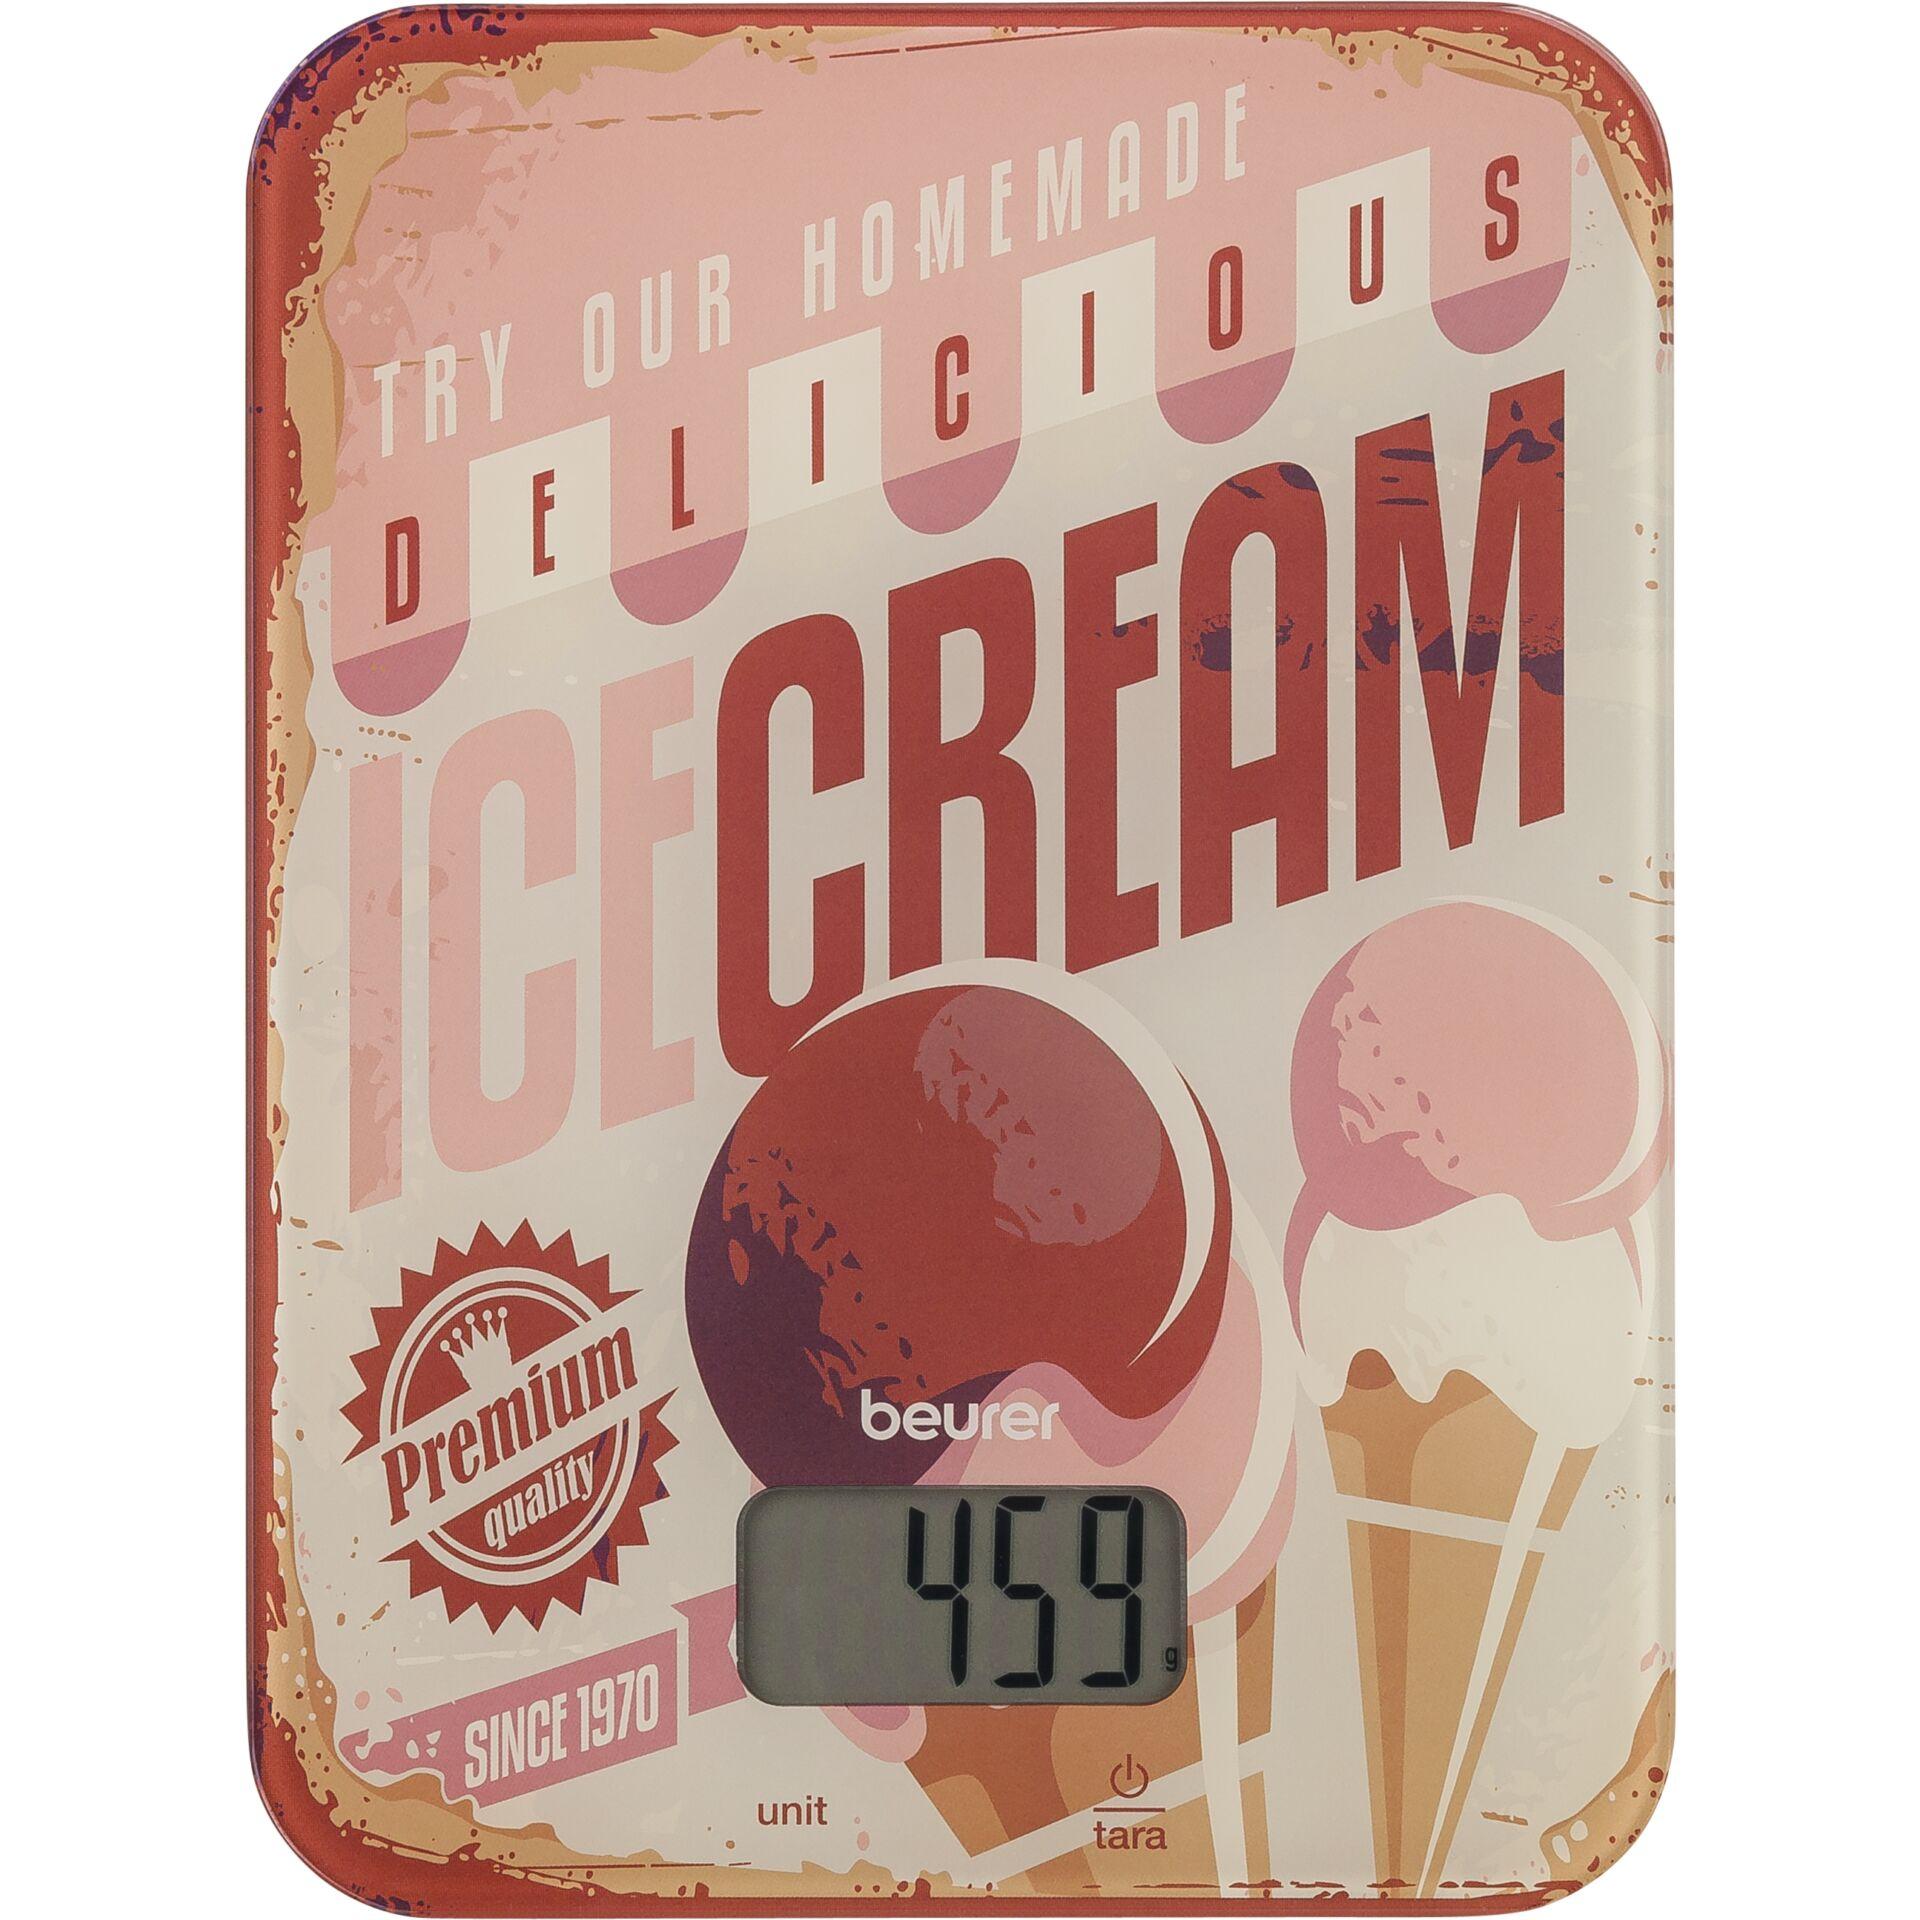 Beurer KS 19 ice cream